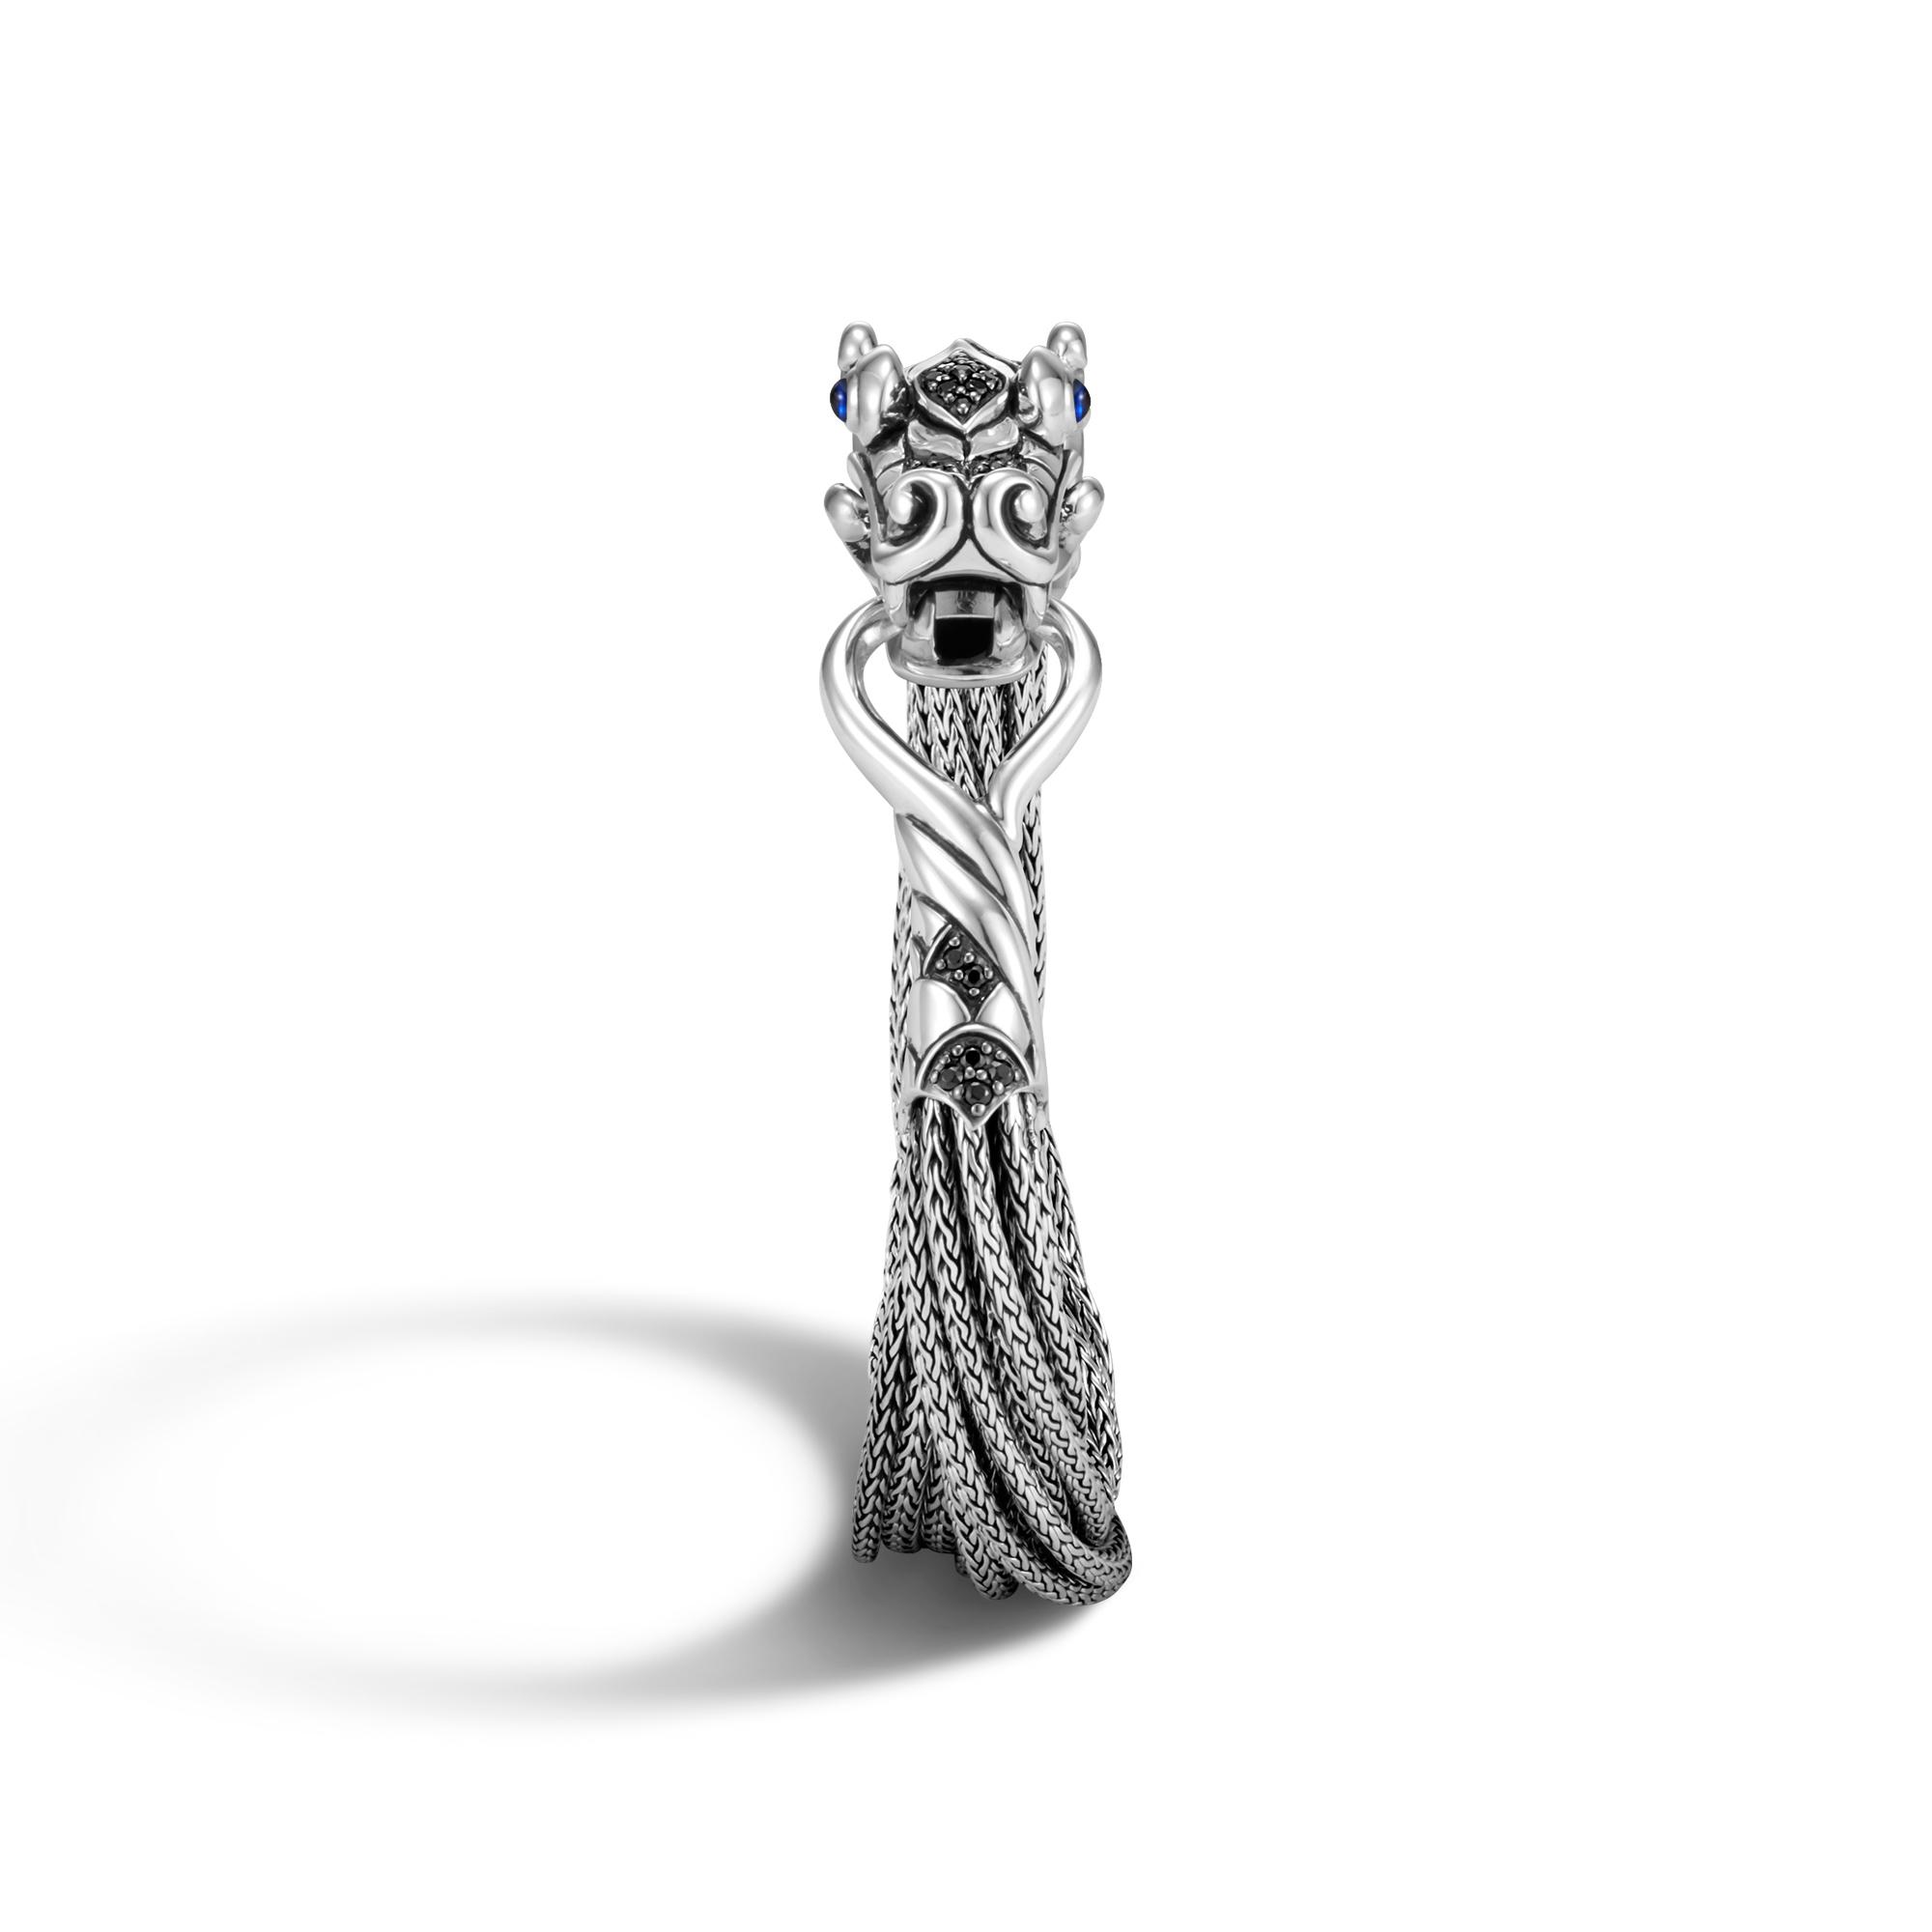 Legends Naga Multi Row Bracelet in Silver with Gemstone, Black Spinel, large